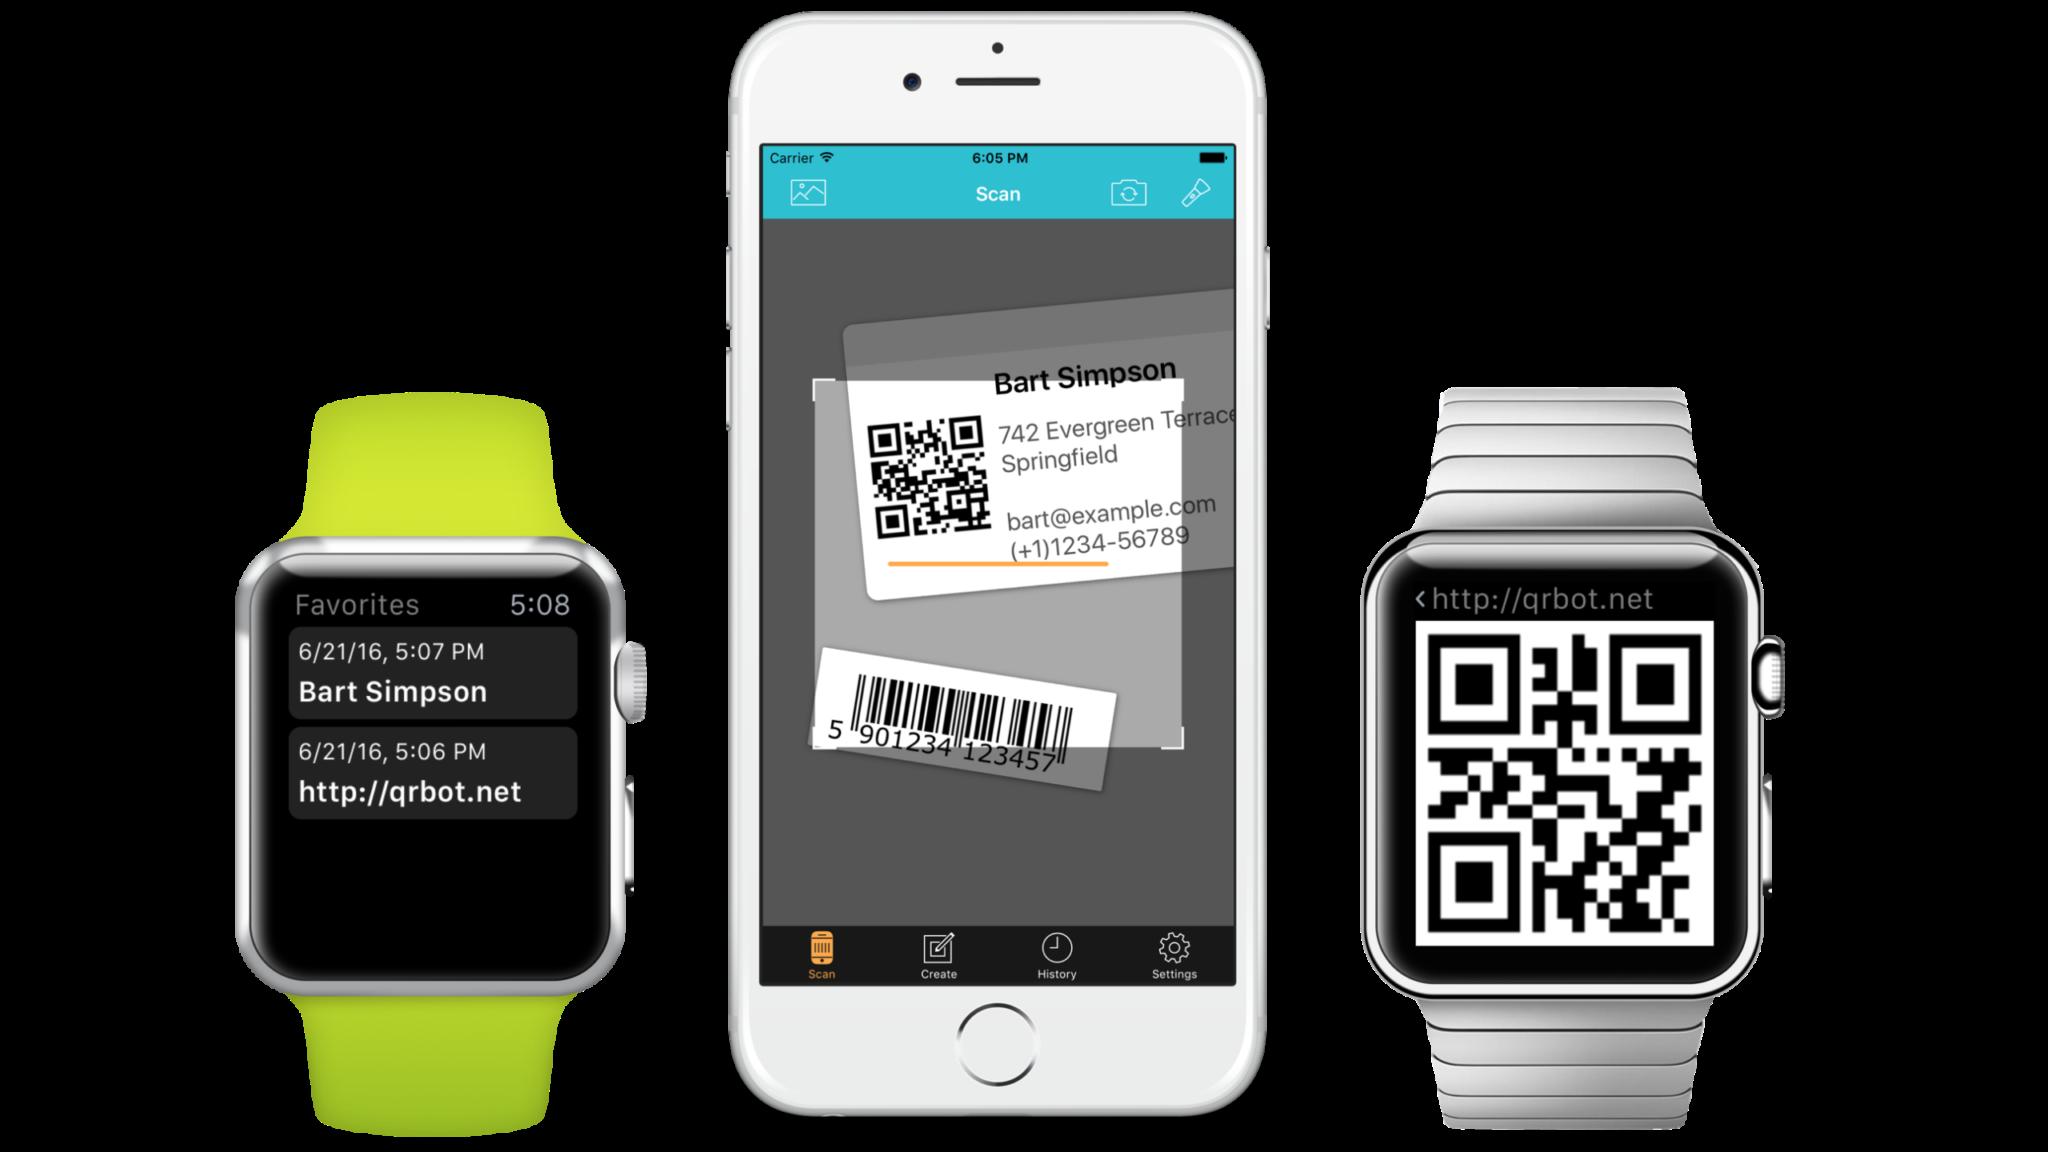 iphone app barcode scanner to spreadsheet natural buff dog. Black Bedroom Furniture Sets. Home Design Ideas